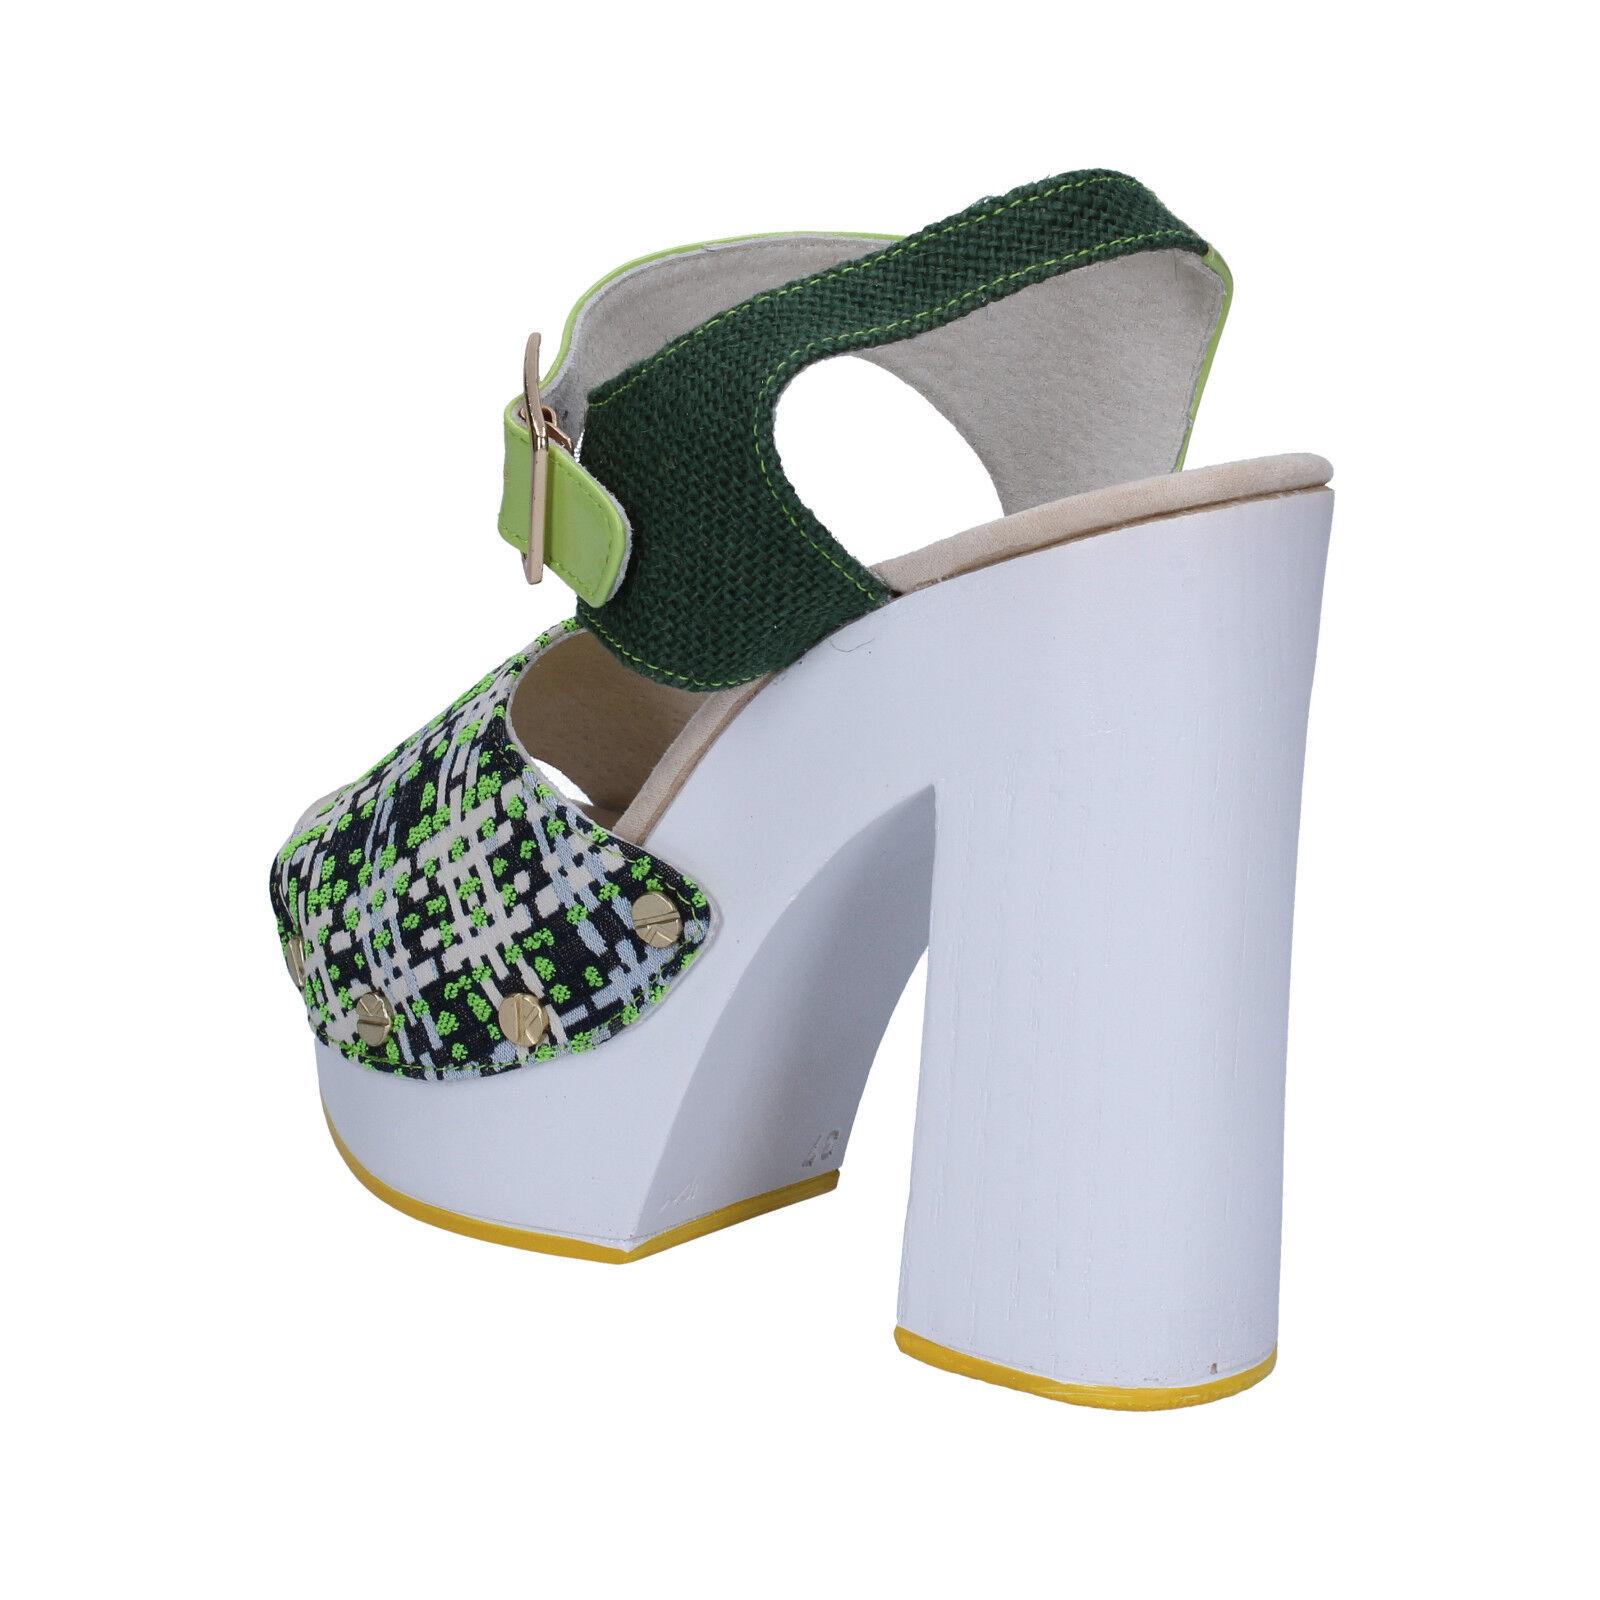 Scarpe Scarpe Scarpe donna SUKY BRAND 38 sandali verde tessuto vernice AC489-C 421e14